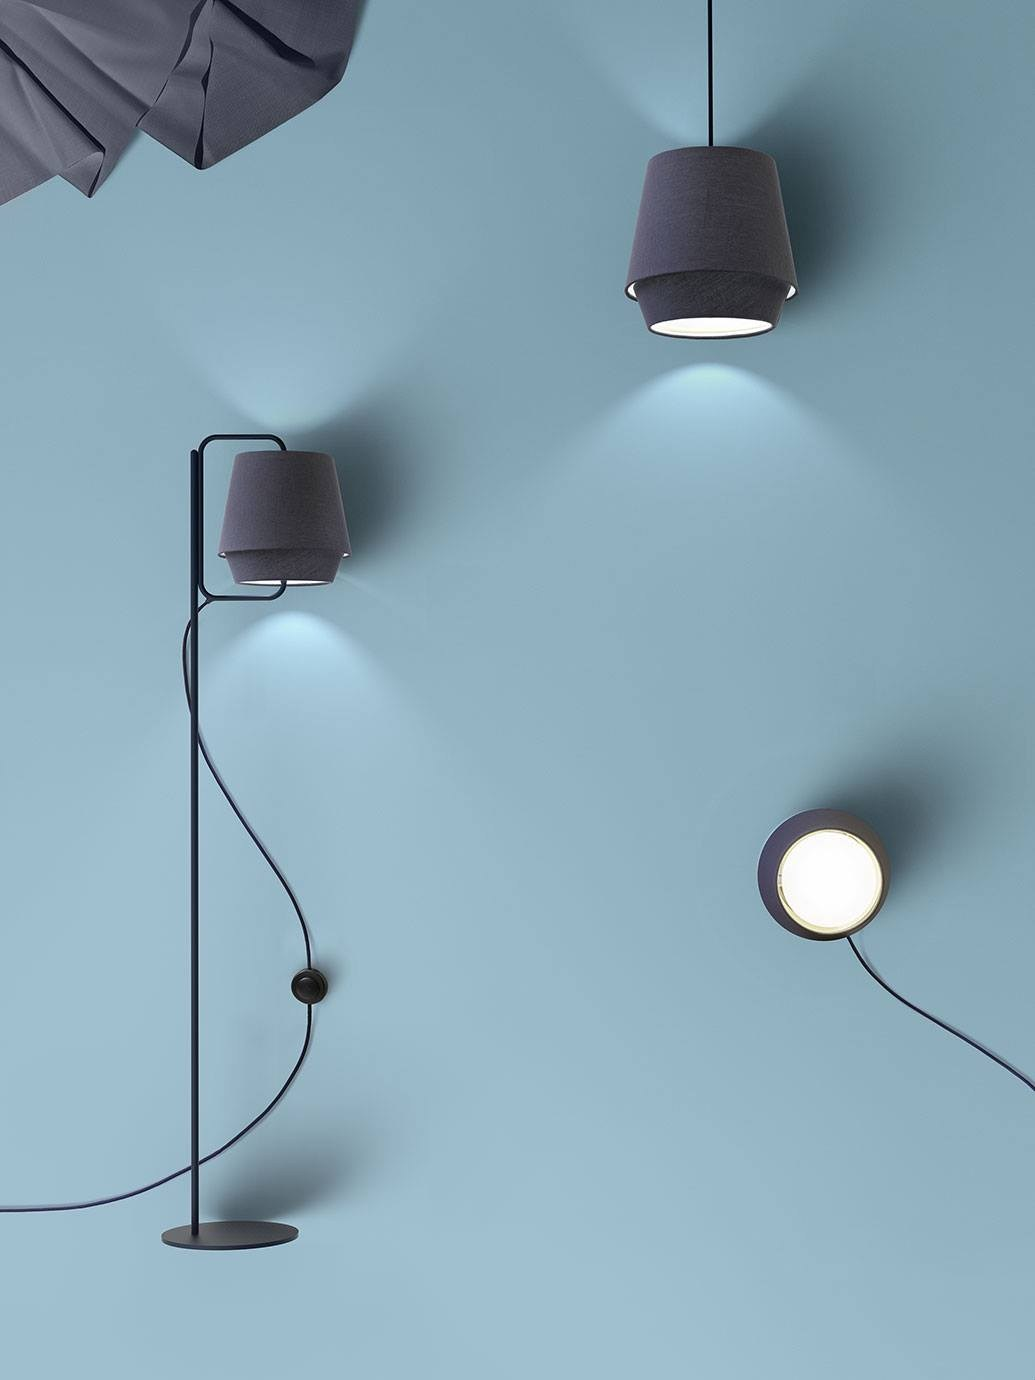 Elements wall light by zero design note design studio